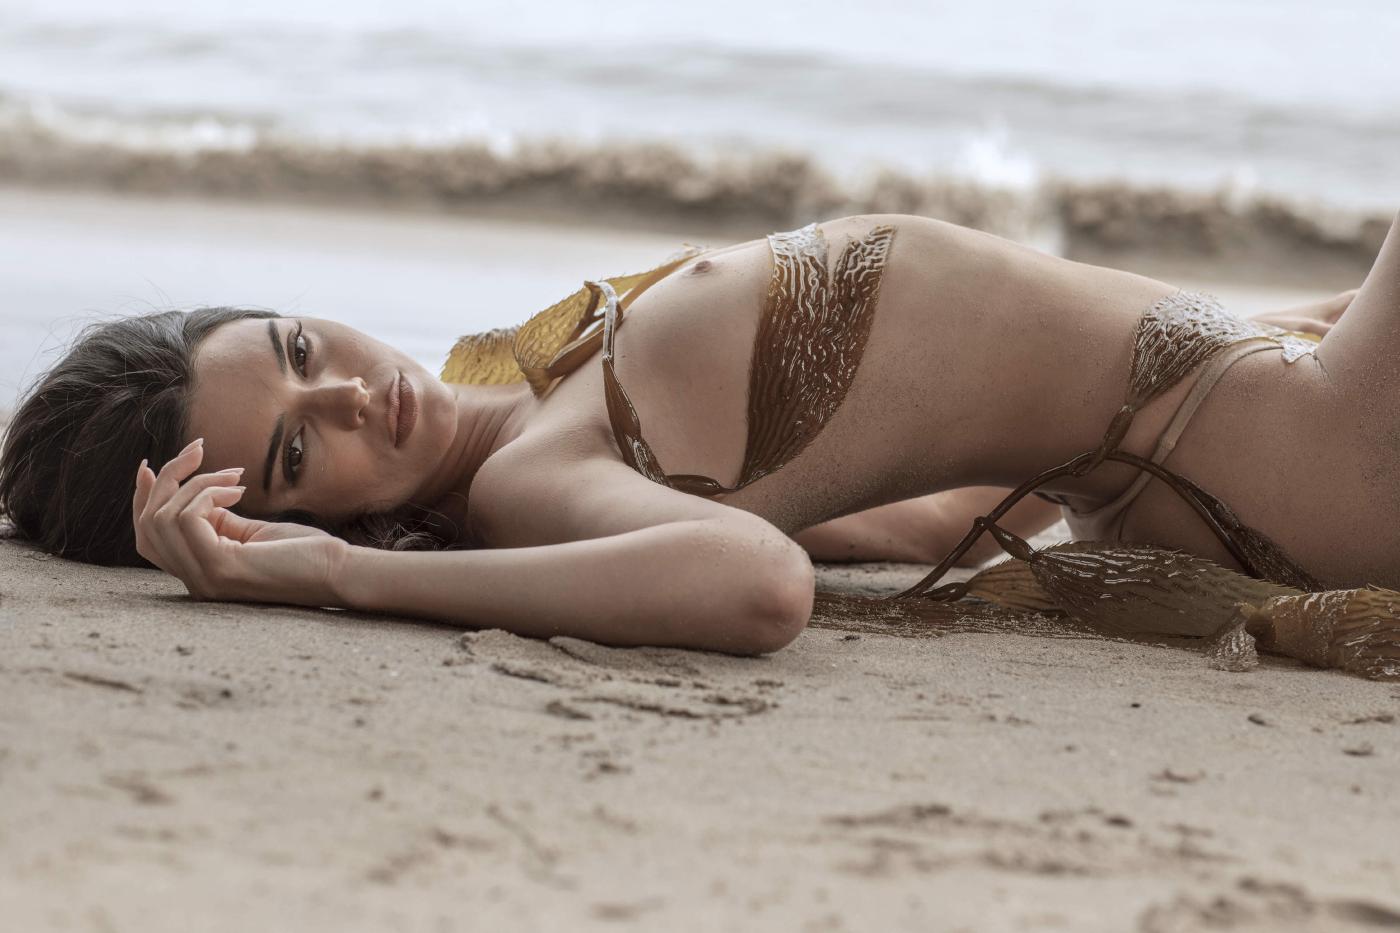 Kendall Jenner Nude Beach Run photo 2